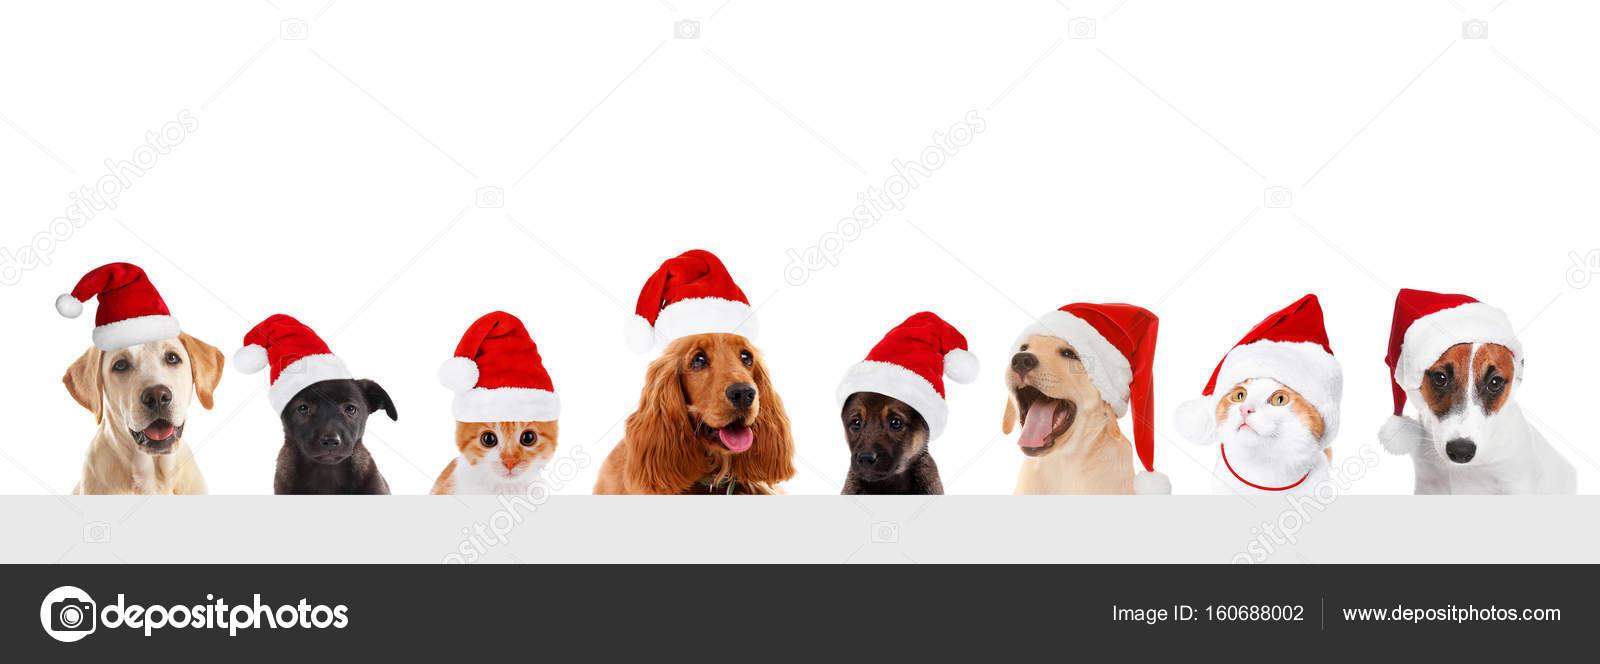 238b696515490 Funny pets in Santa hats — Stock Photo © belchonock  160688002